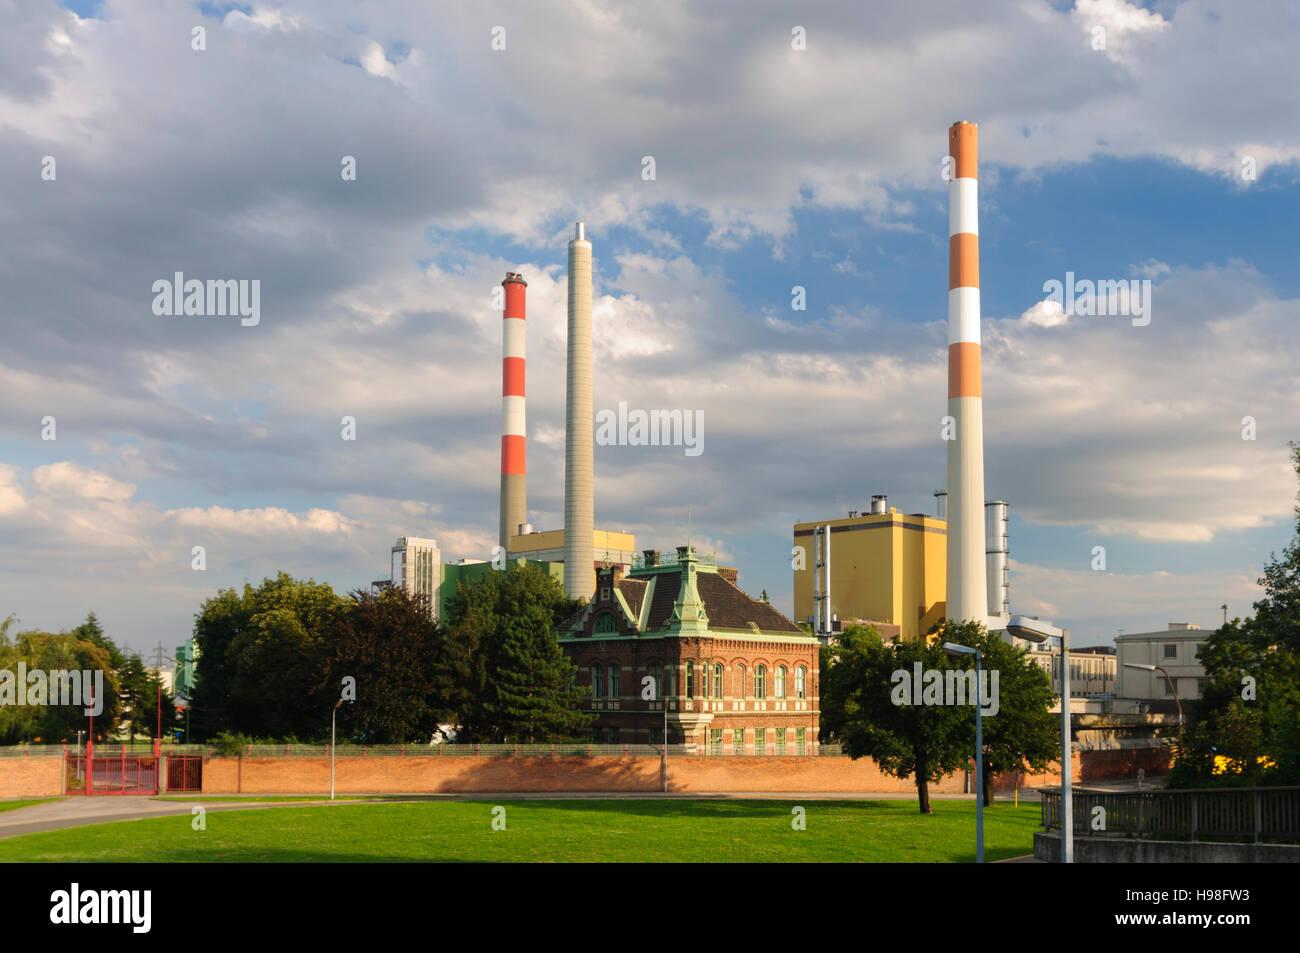 Wien, Vienna: Simmering power station of Wienstrom, 11., Wien, Austria - Stock Image